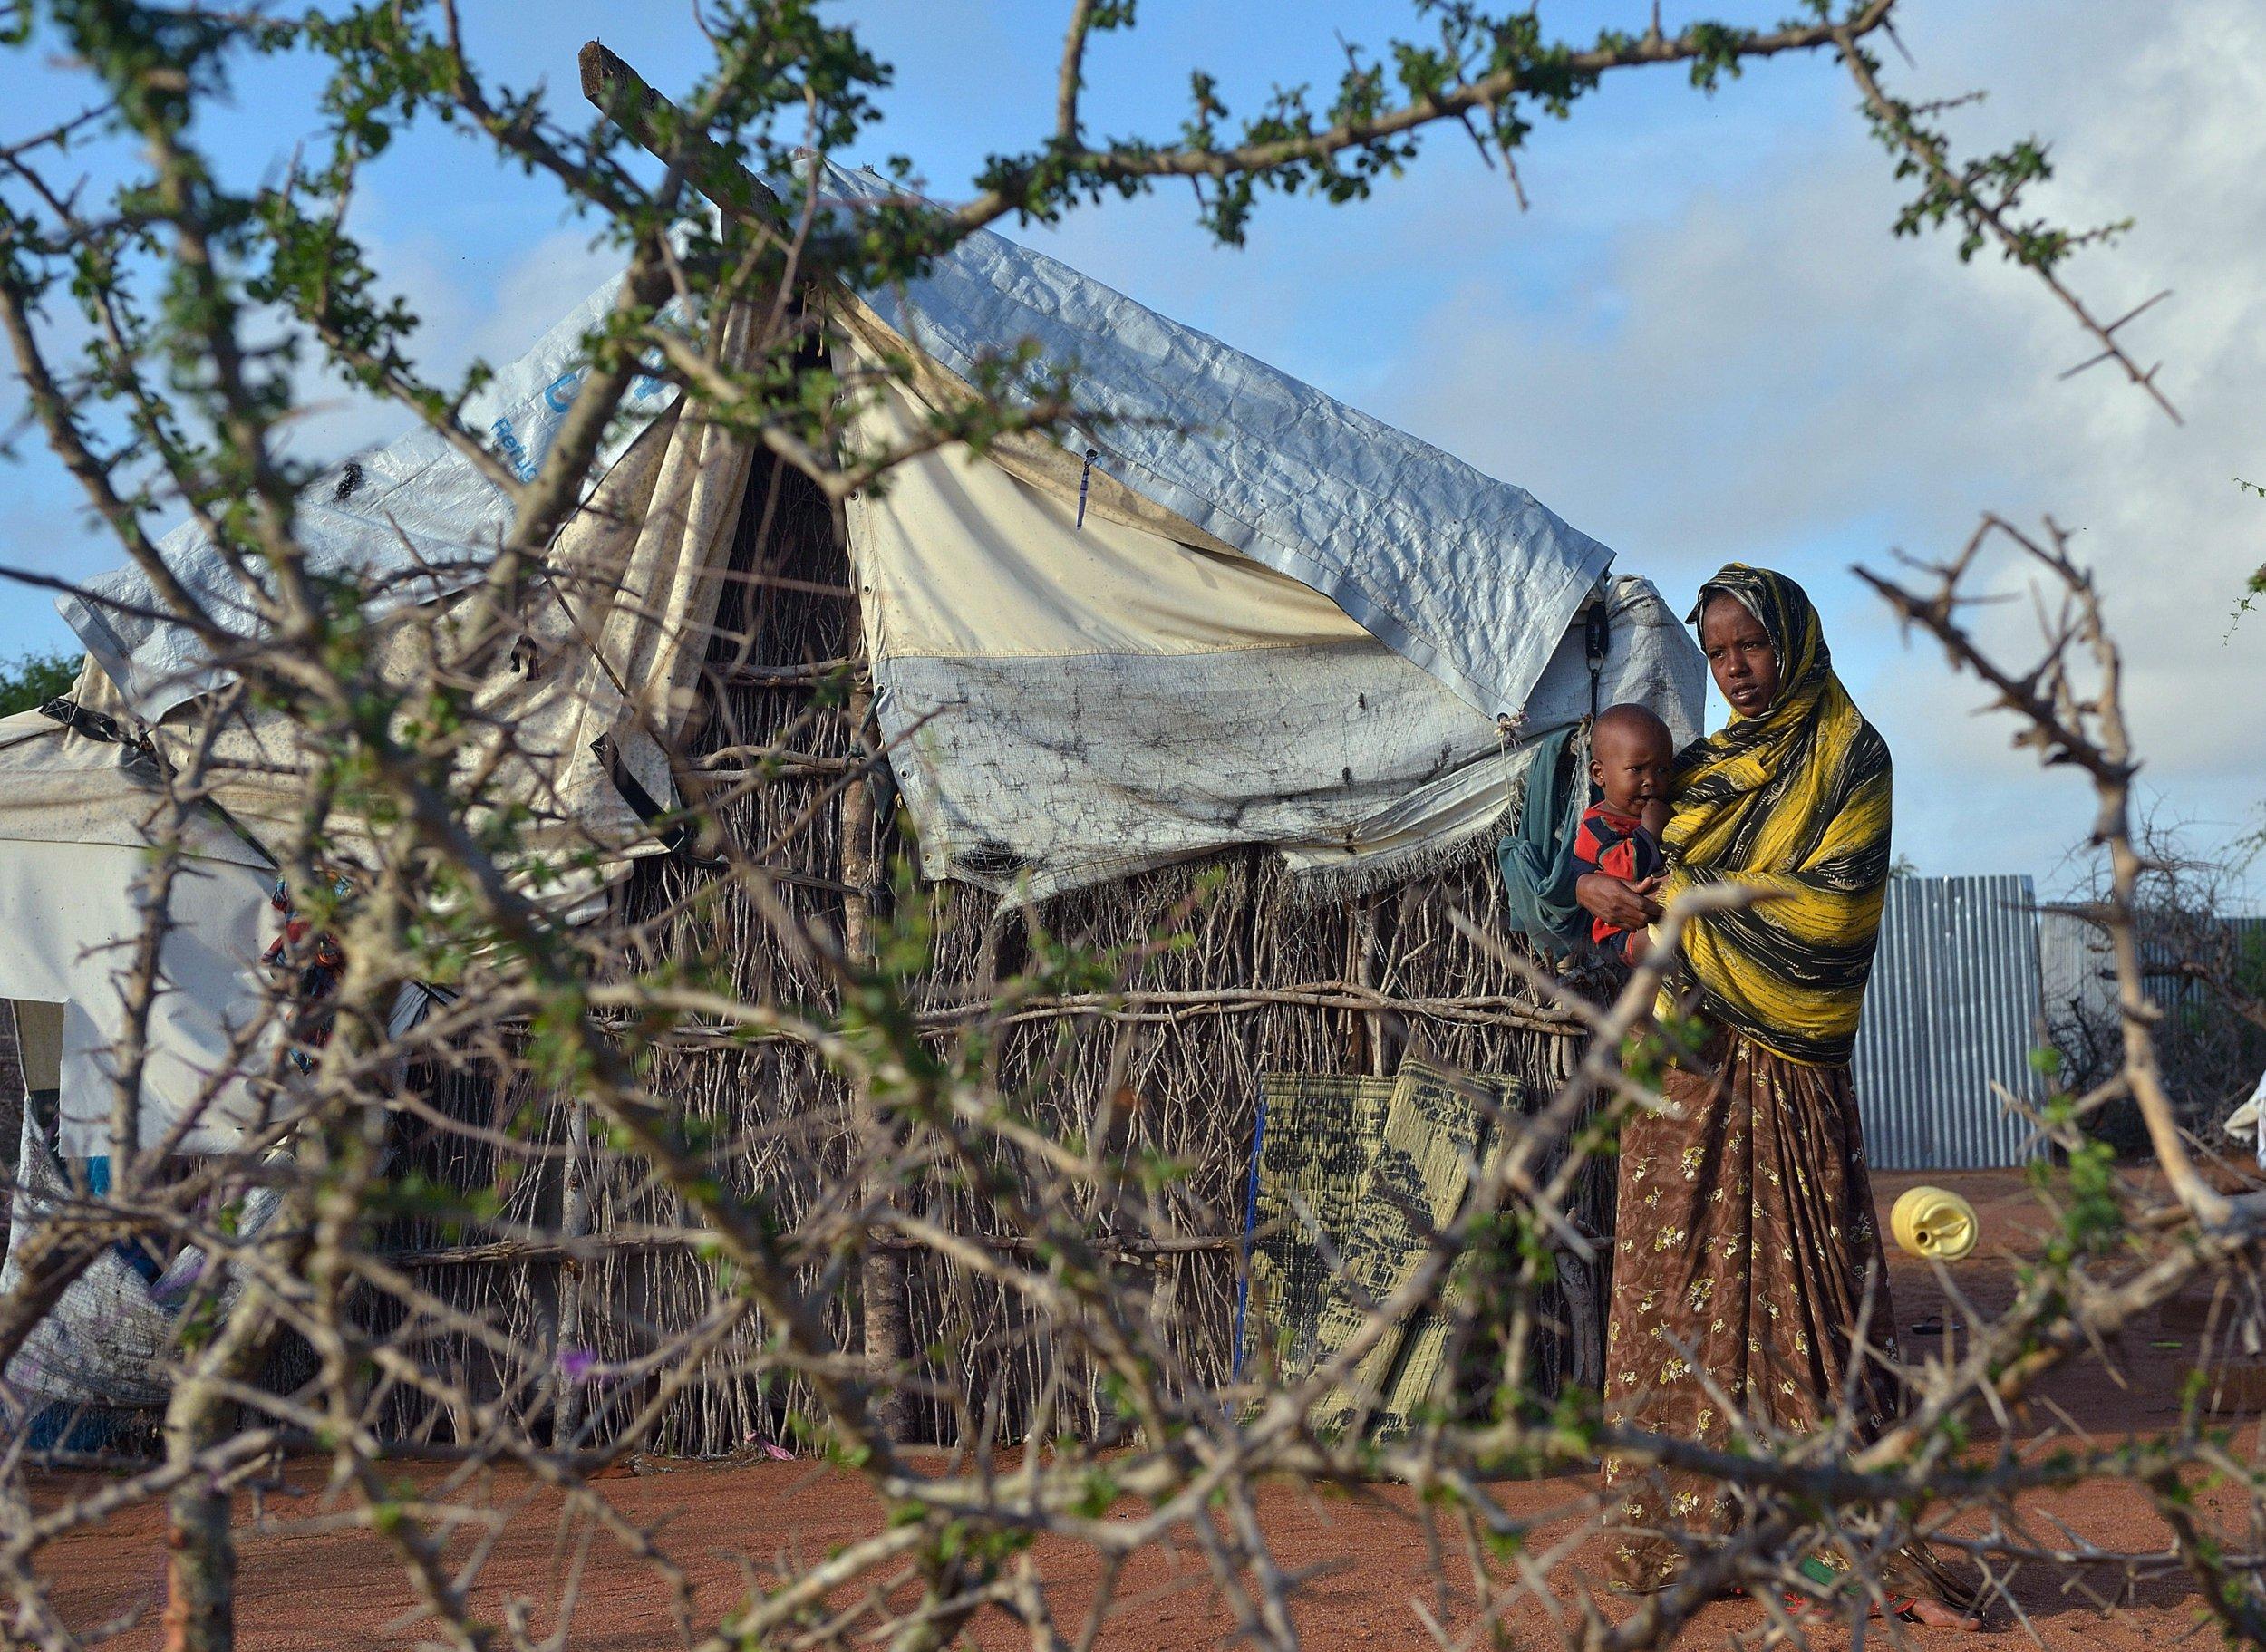 Somali refugee woman at Dadaab